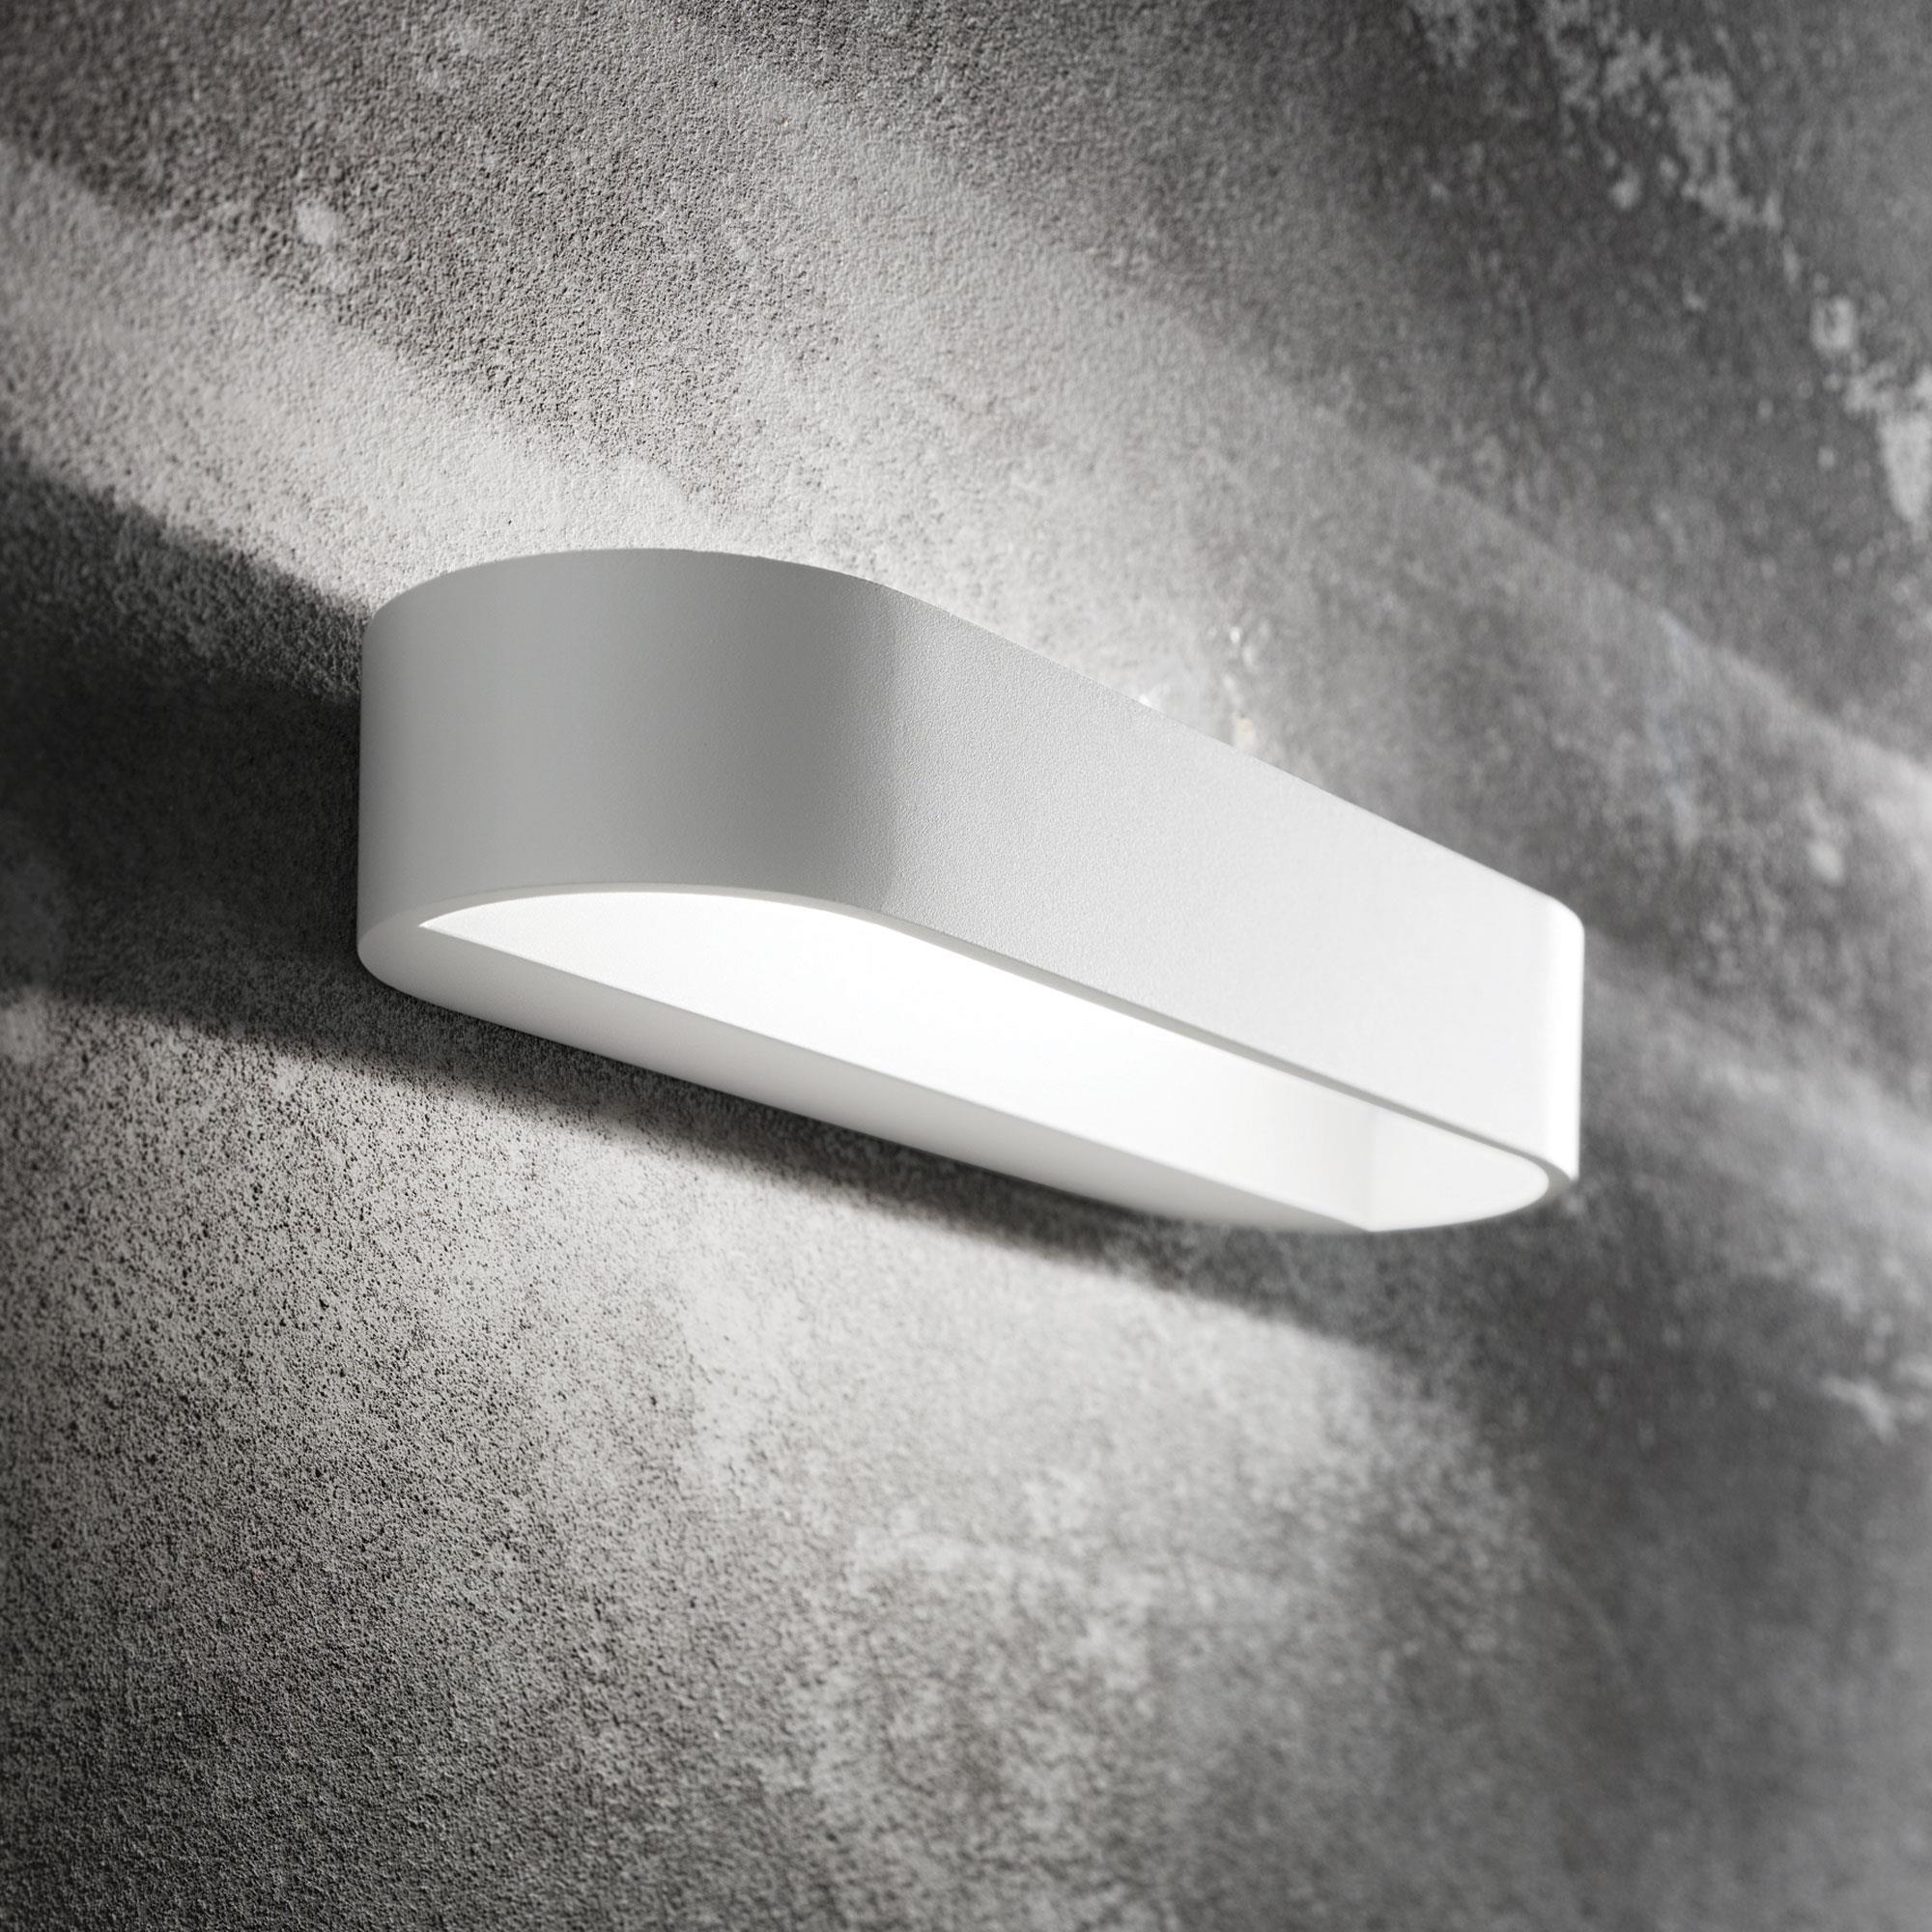 Ideal Lux 162089 LOLA AP1 SMALL LED falilámpa